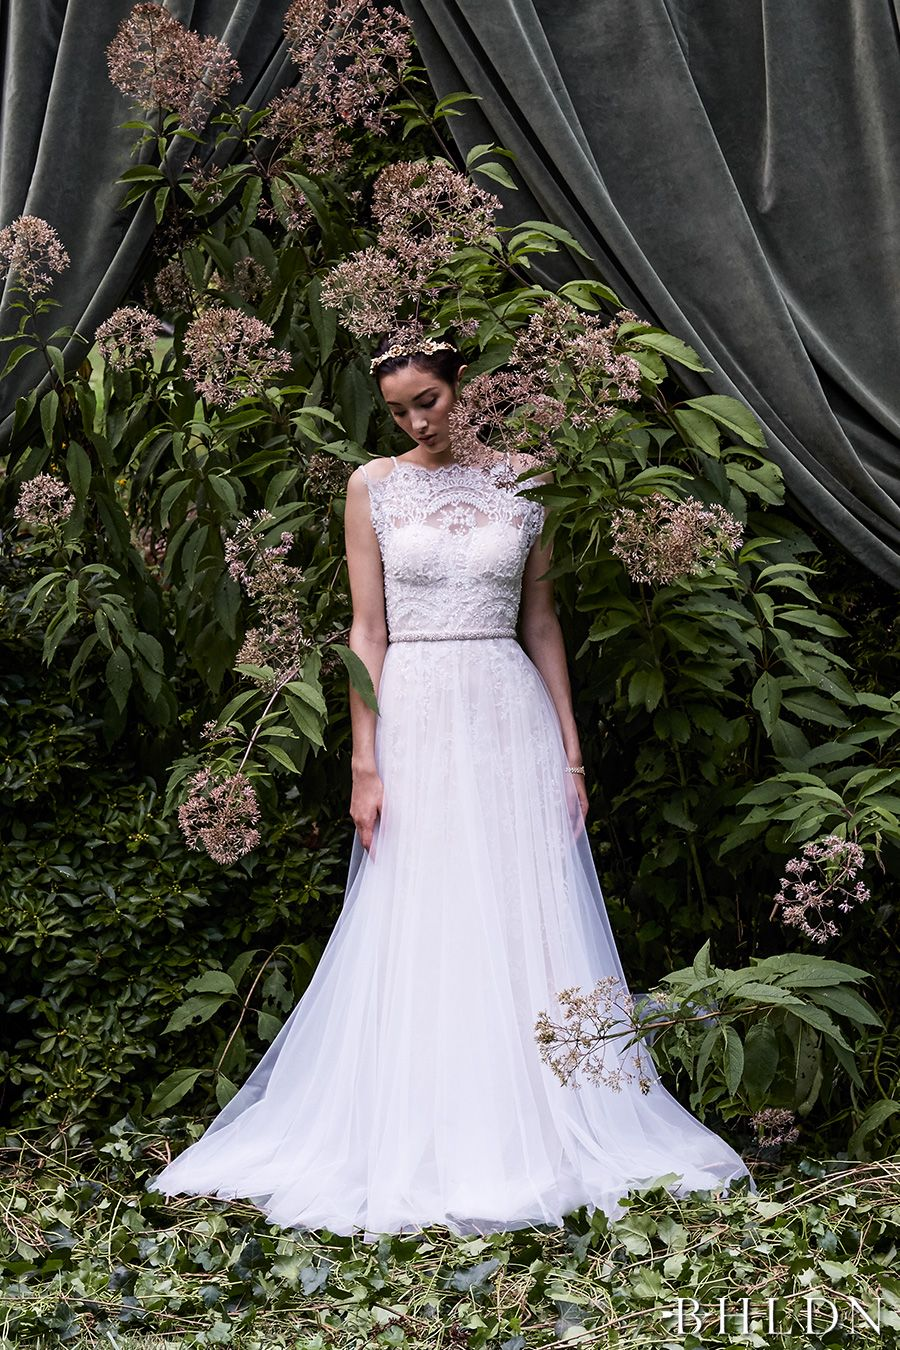 67f365518b16 bhldn fall 2016 bridal sleeveless double strap illusion high neck  sweetheart neckline heavily embellished bodice tulle skirt romantic a line  wedding dress ...